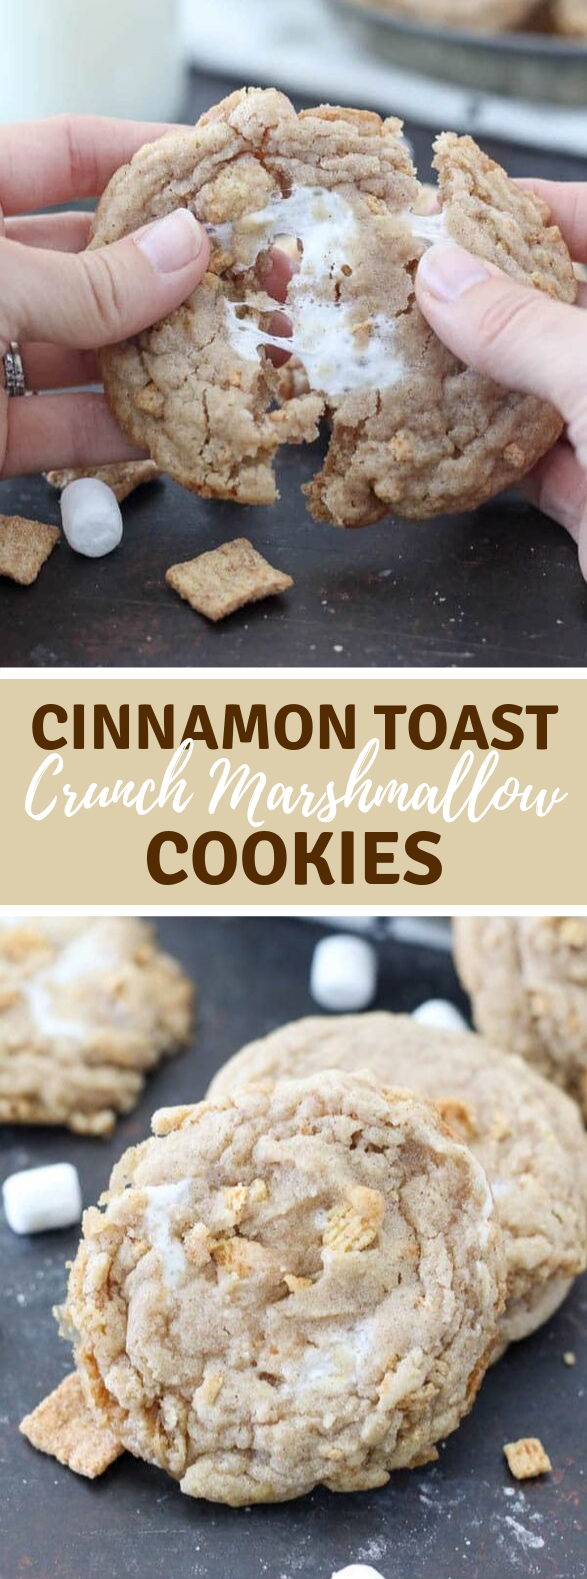 Cinnamon Toast Crunch Marshmallow Cookies #desserts #ooeygooey